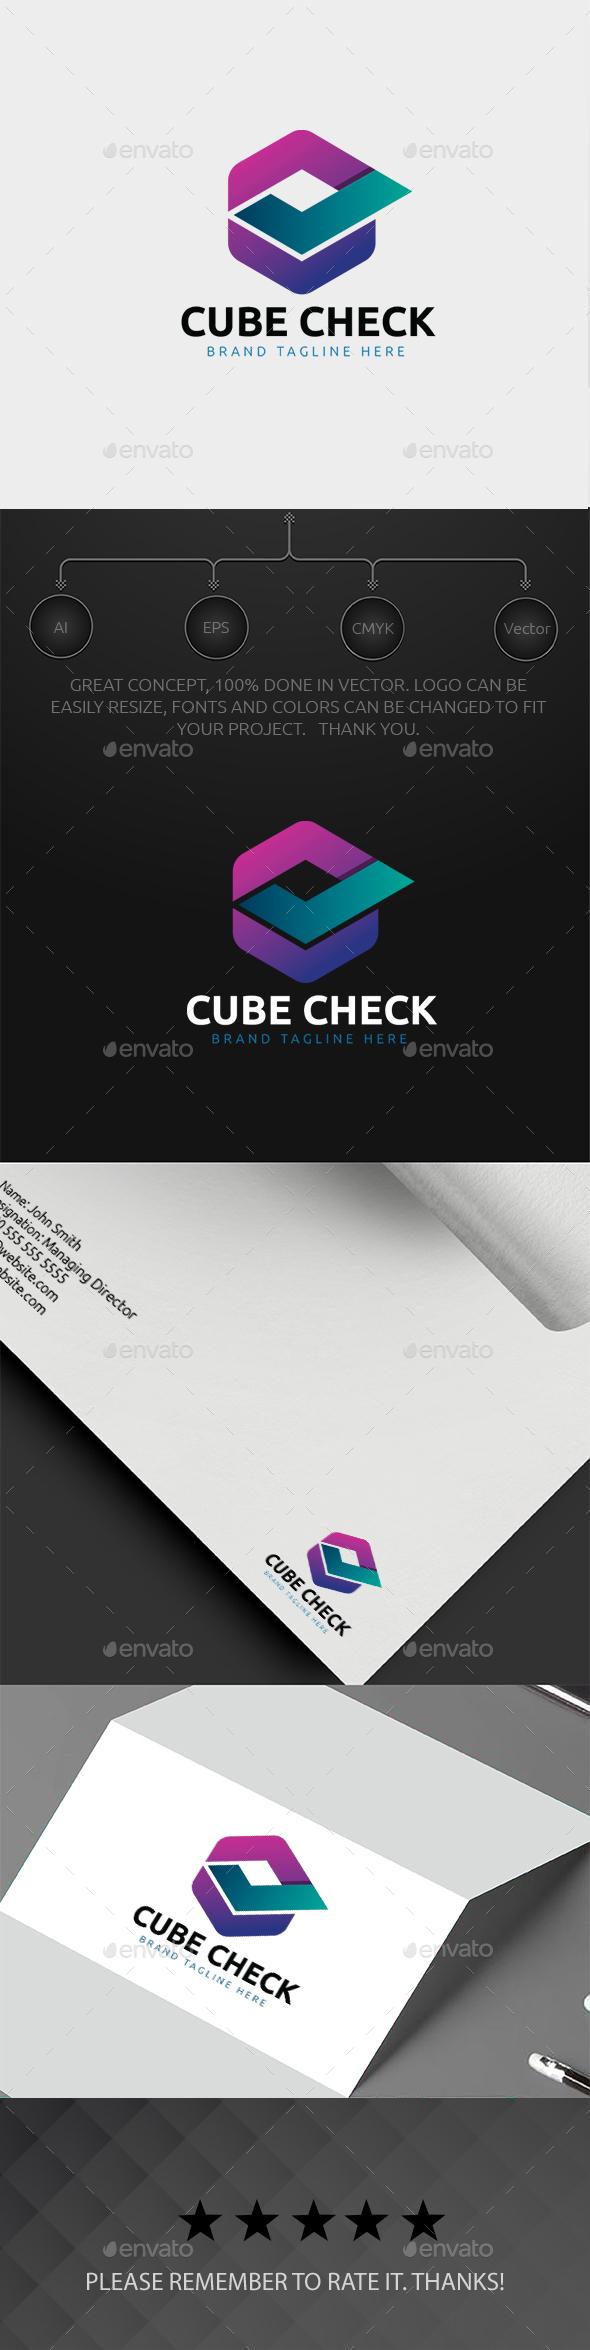 Cube Check Logo - Symbols Logo Templates